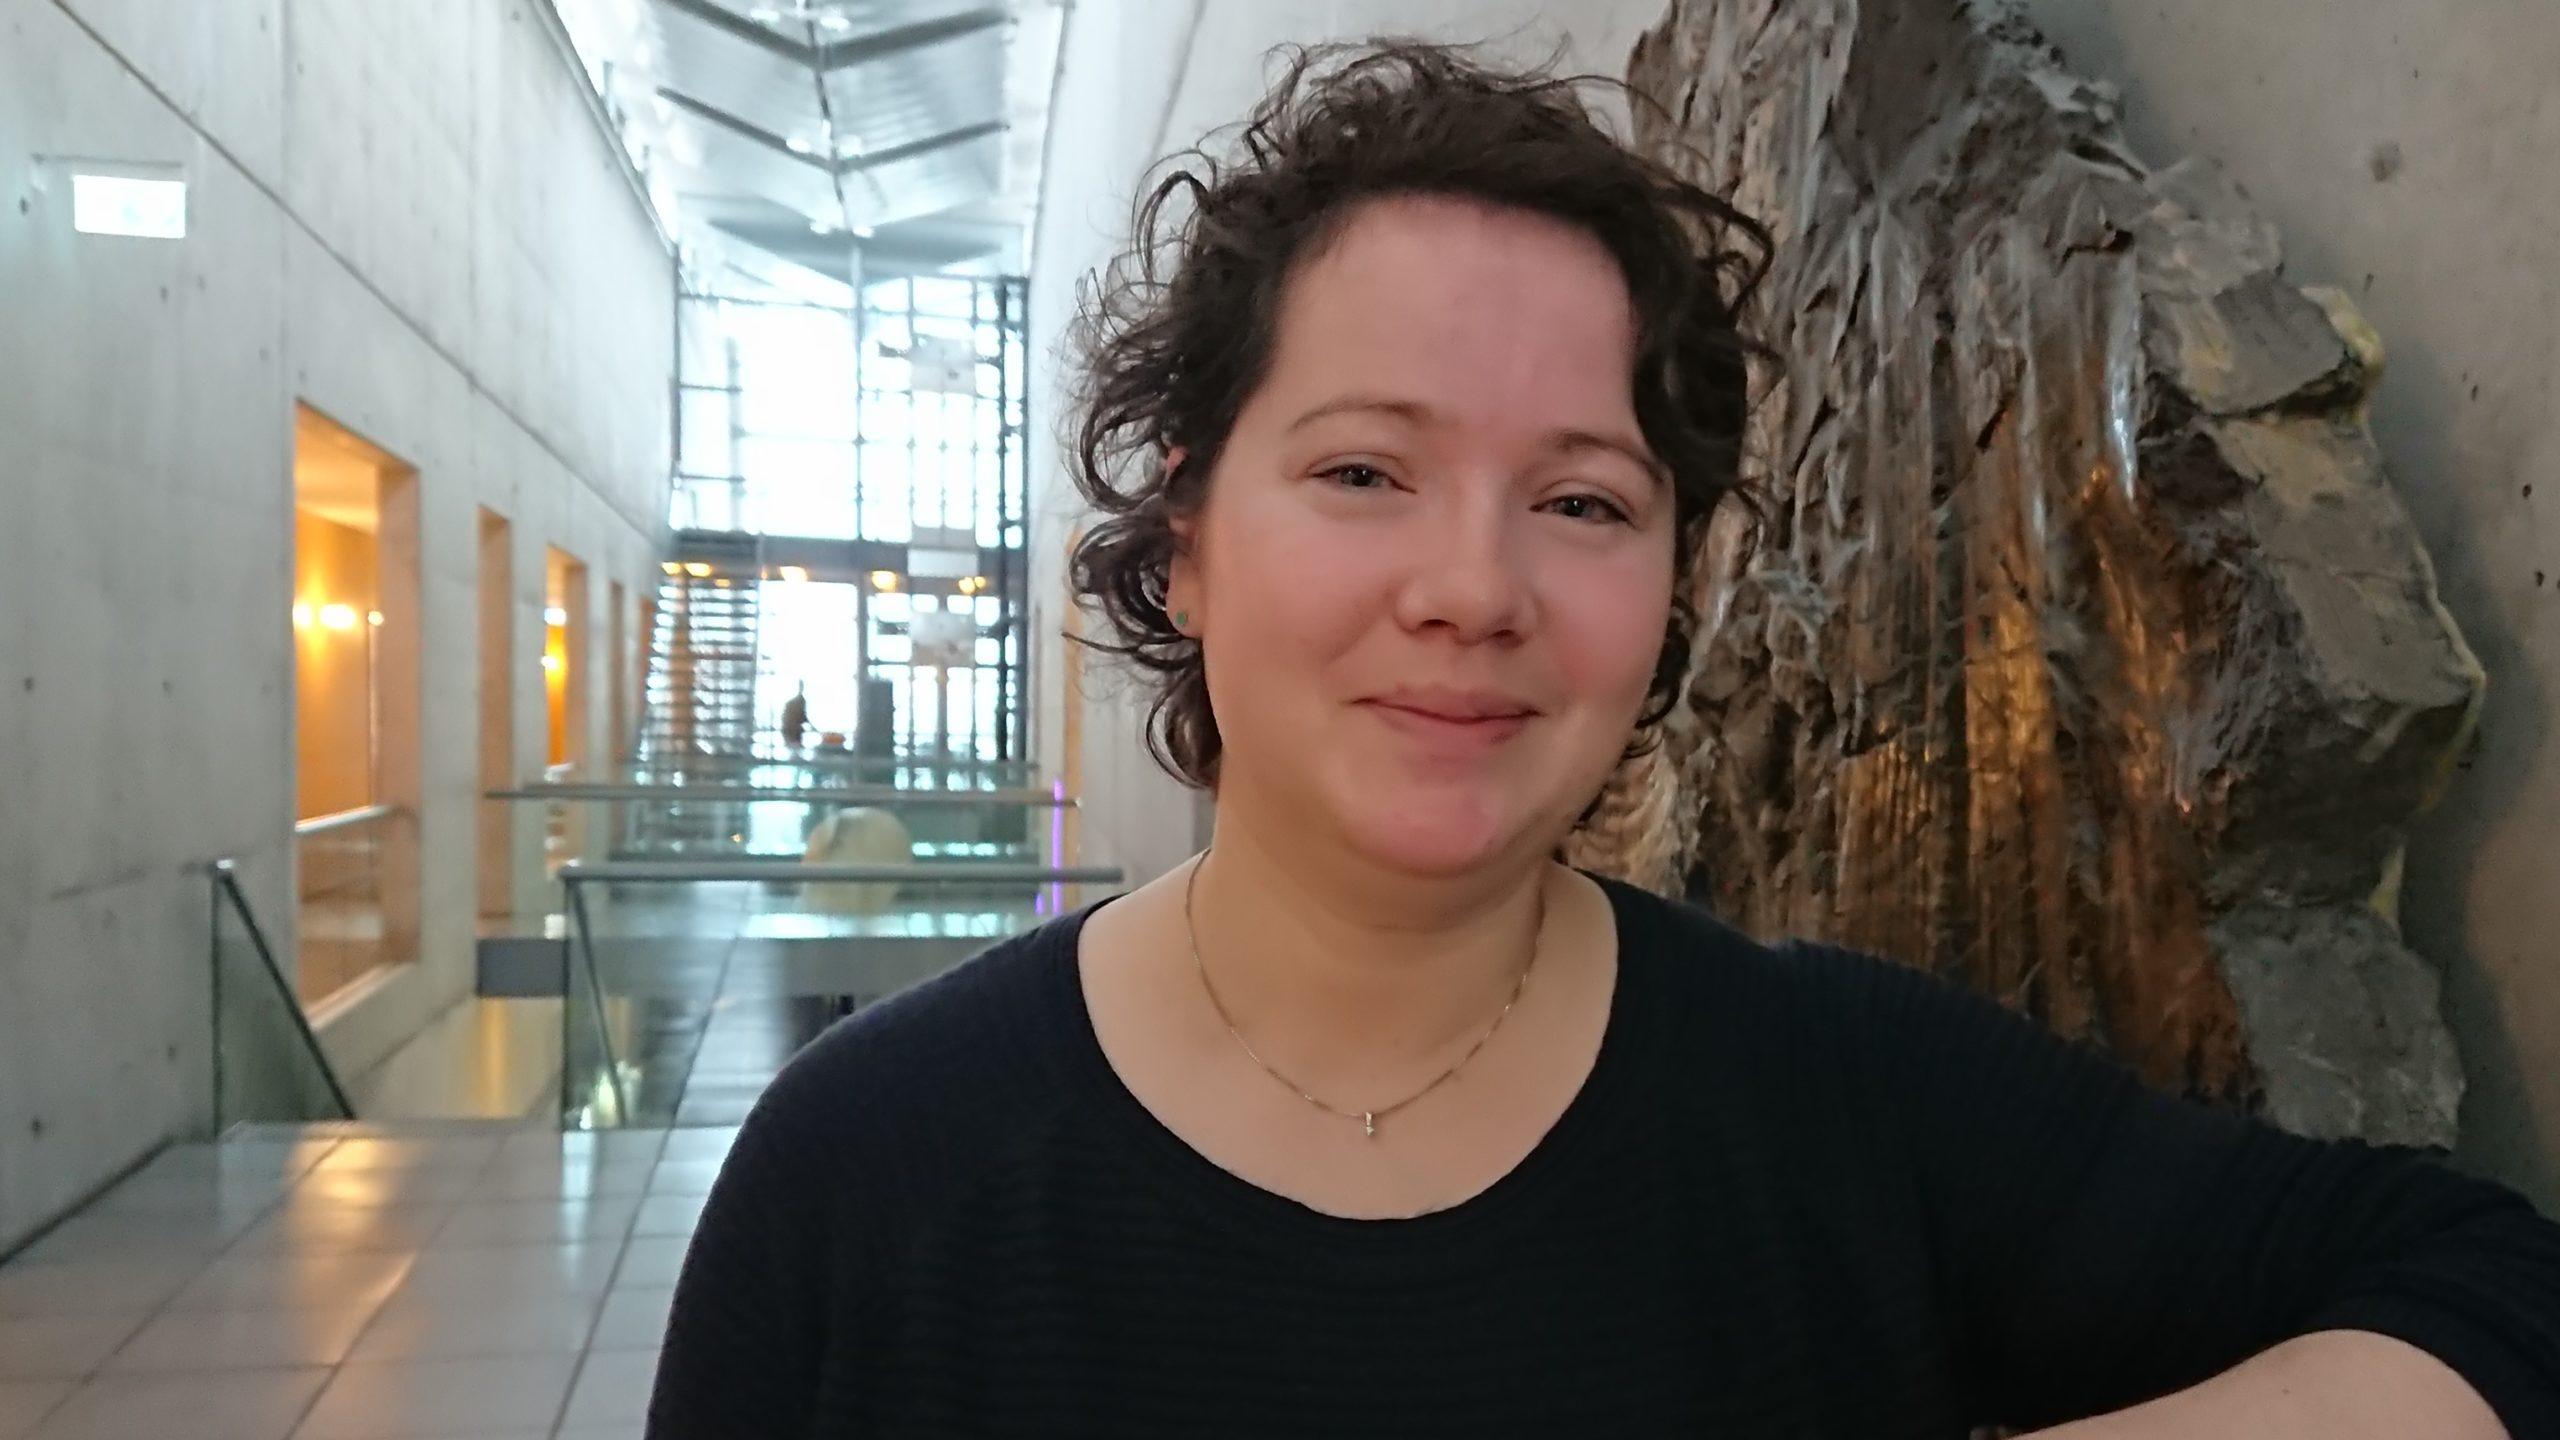 #17 Majken Djurhuus Poulsen, rubin-forsker i Nuuk